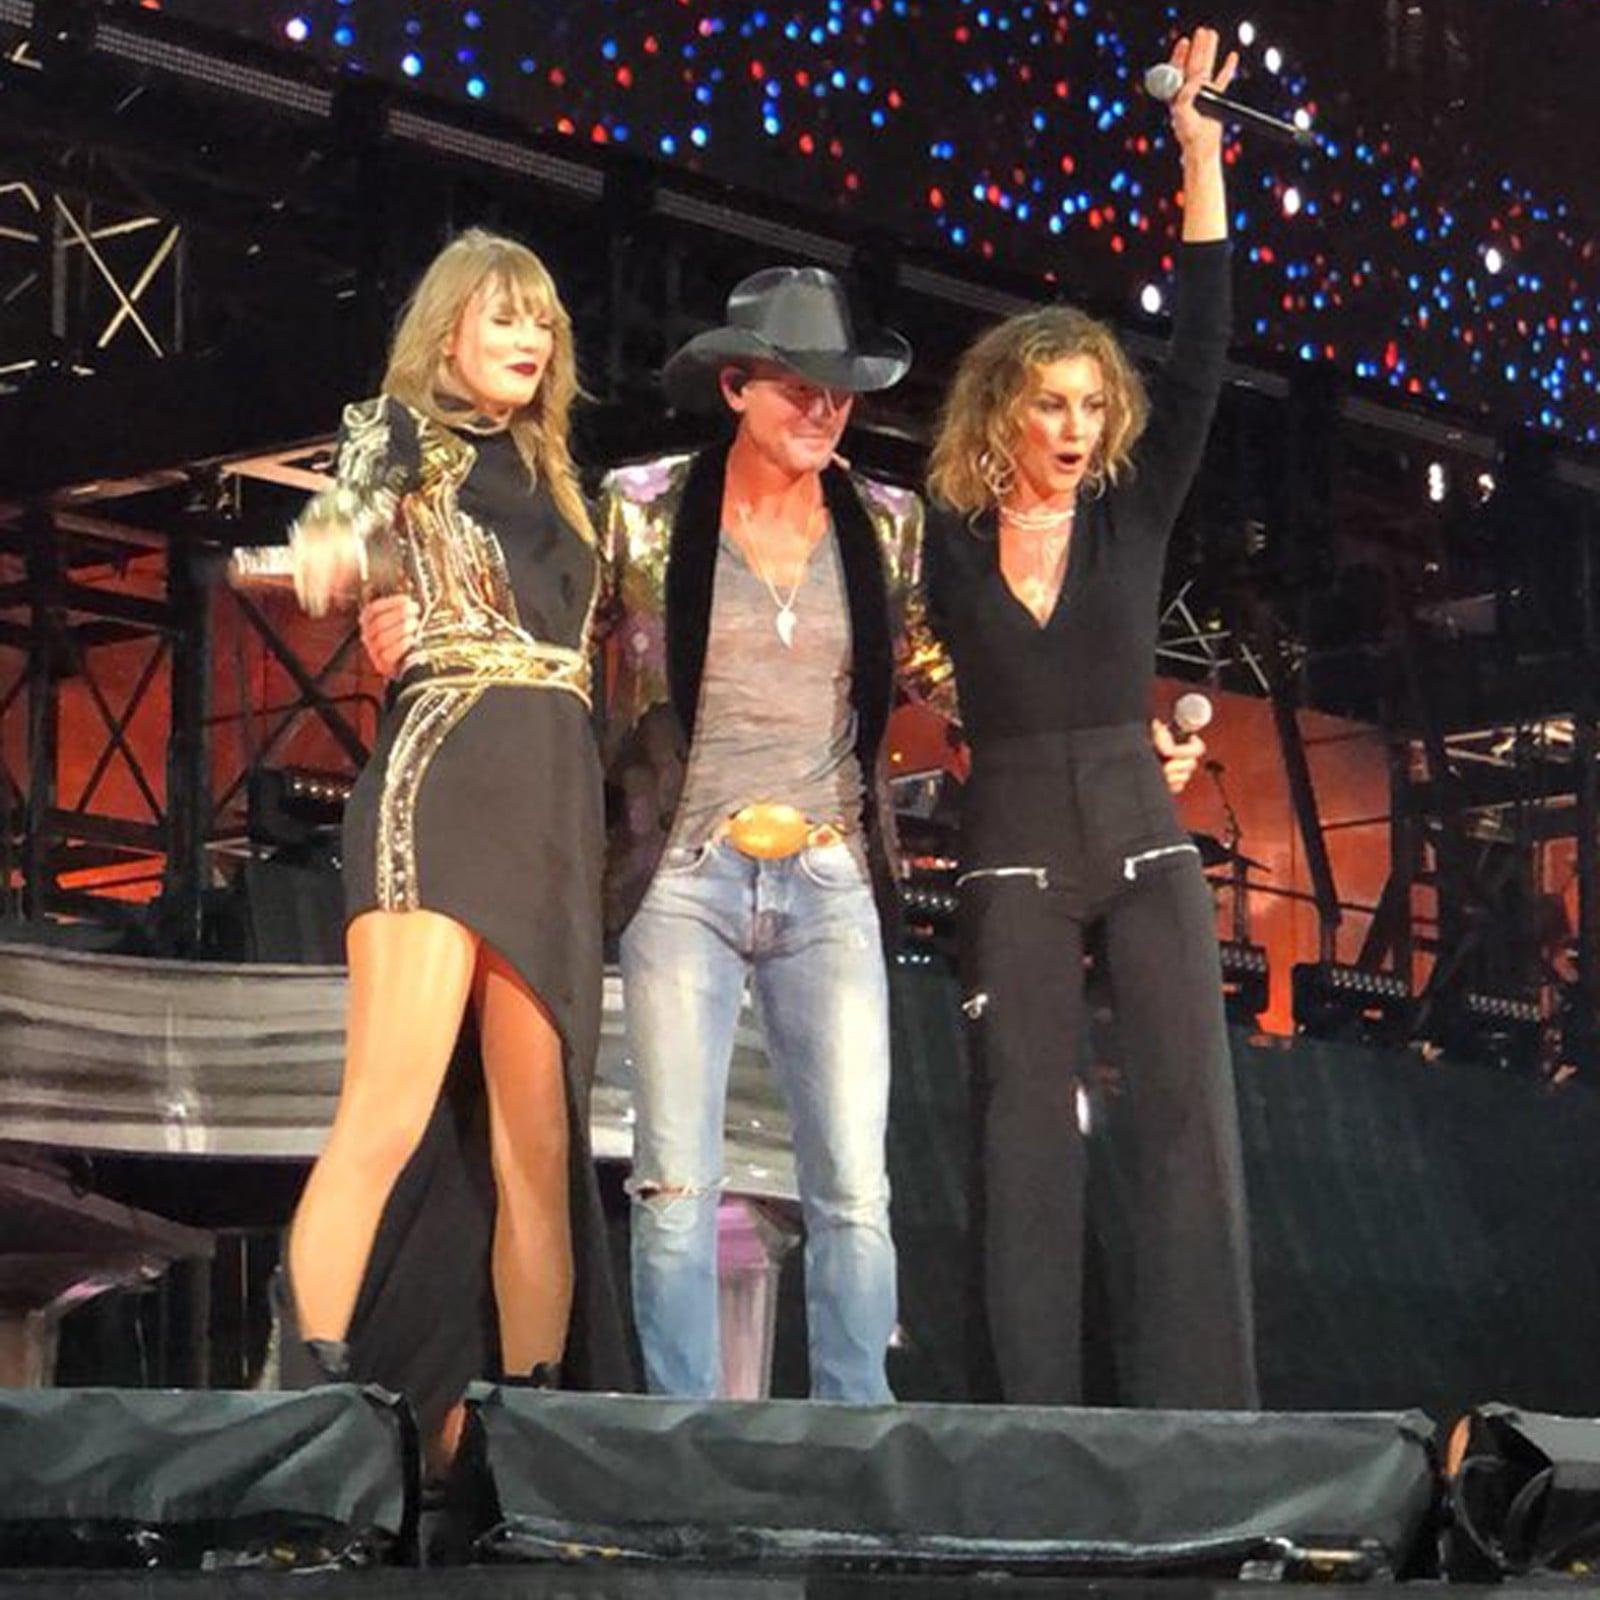 Taylor Swift With Tim Mcgraw And Faith Hill Reputation Tour Popsugar Celebrity Australia